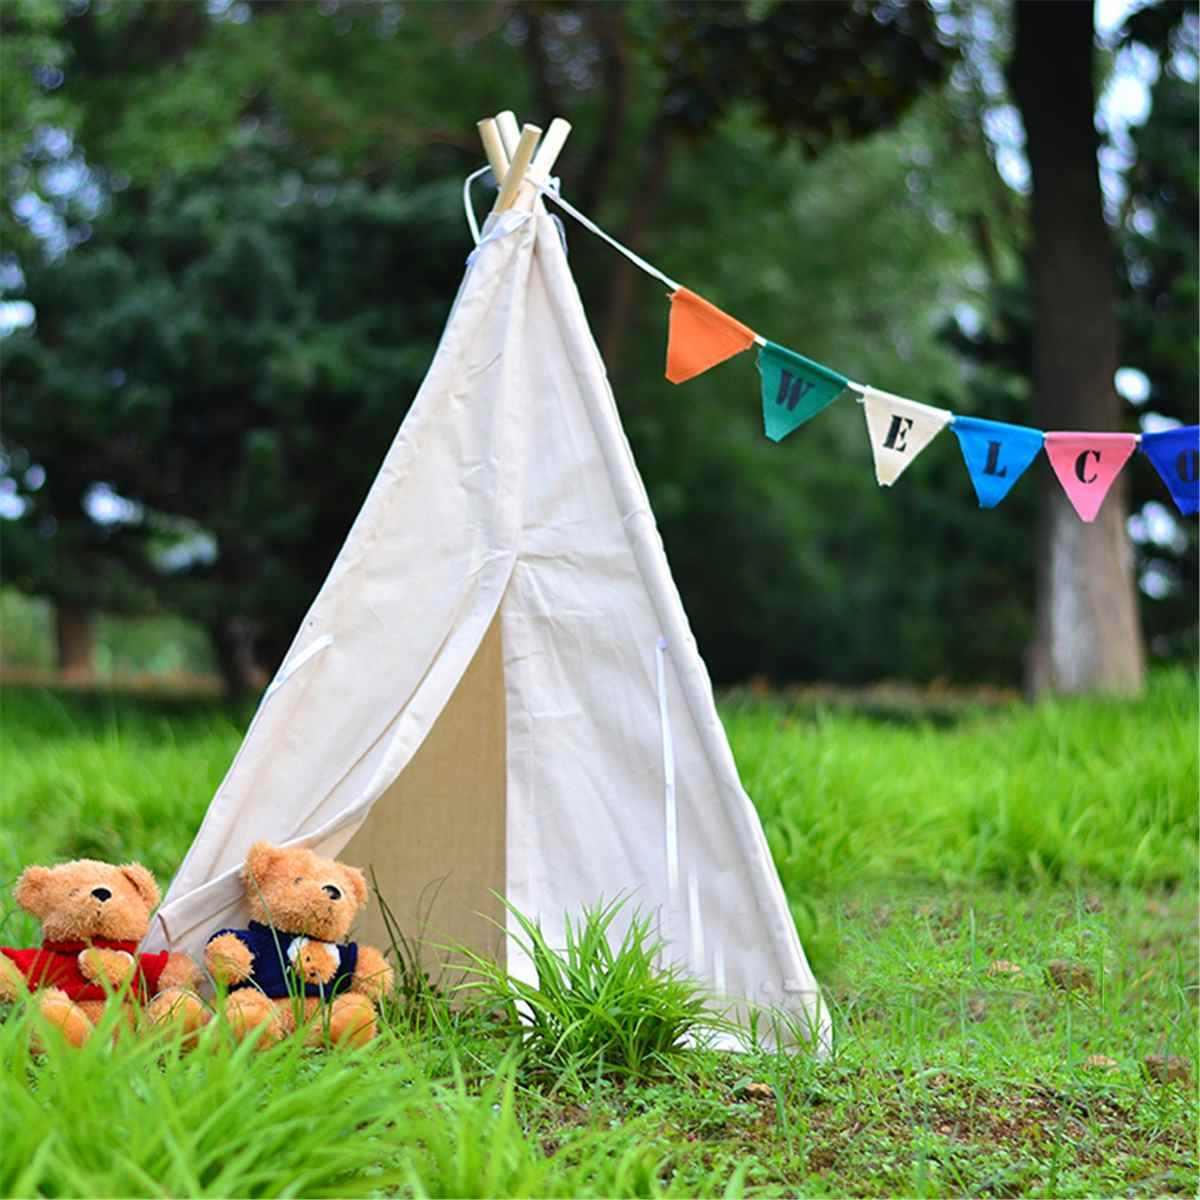 Tipi 텐트 어린이 놀이 텐트 Teepee 하우스 Wigwam 룸 어린이 텐트 게임 하우스 삼각형 Teepee 캔버스 슬리핑 돔 130cm